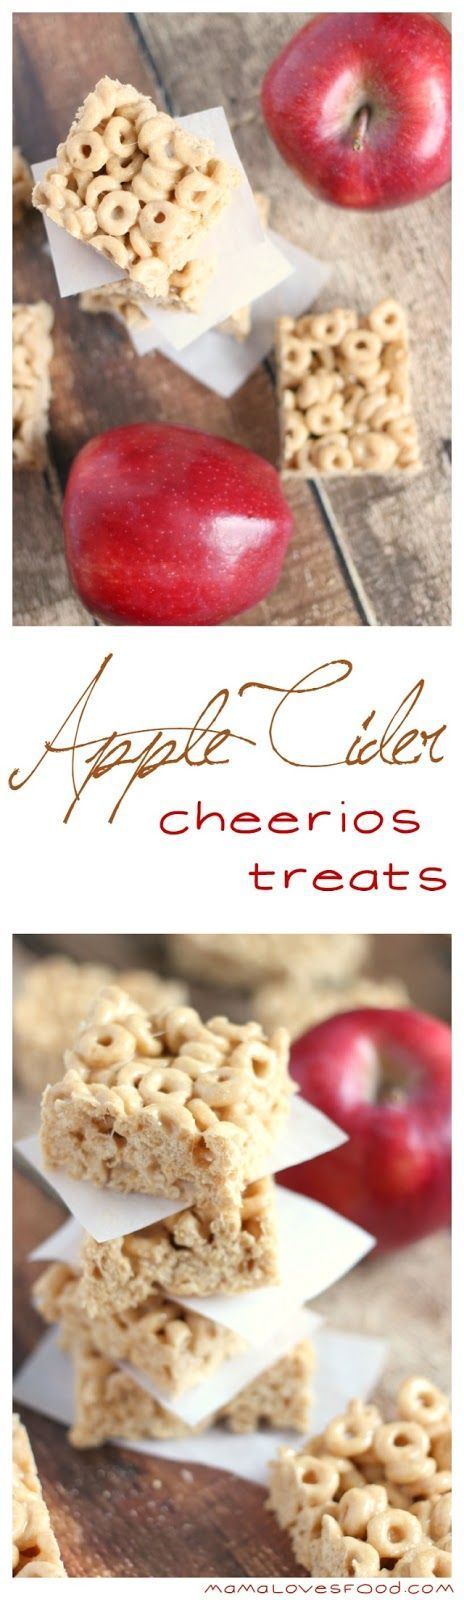 Apple Cider Cheerios Treats #Albertsons #astockupsale ad